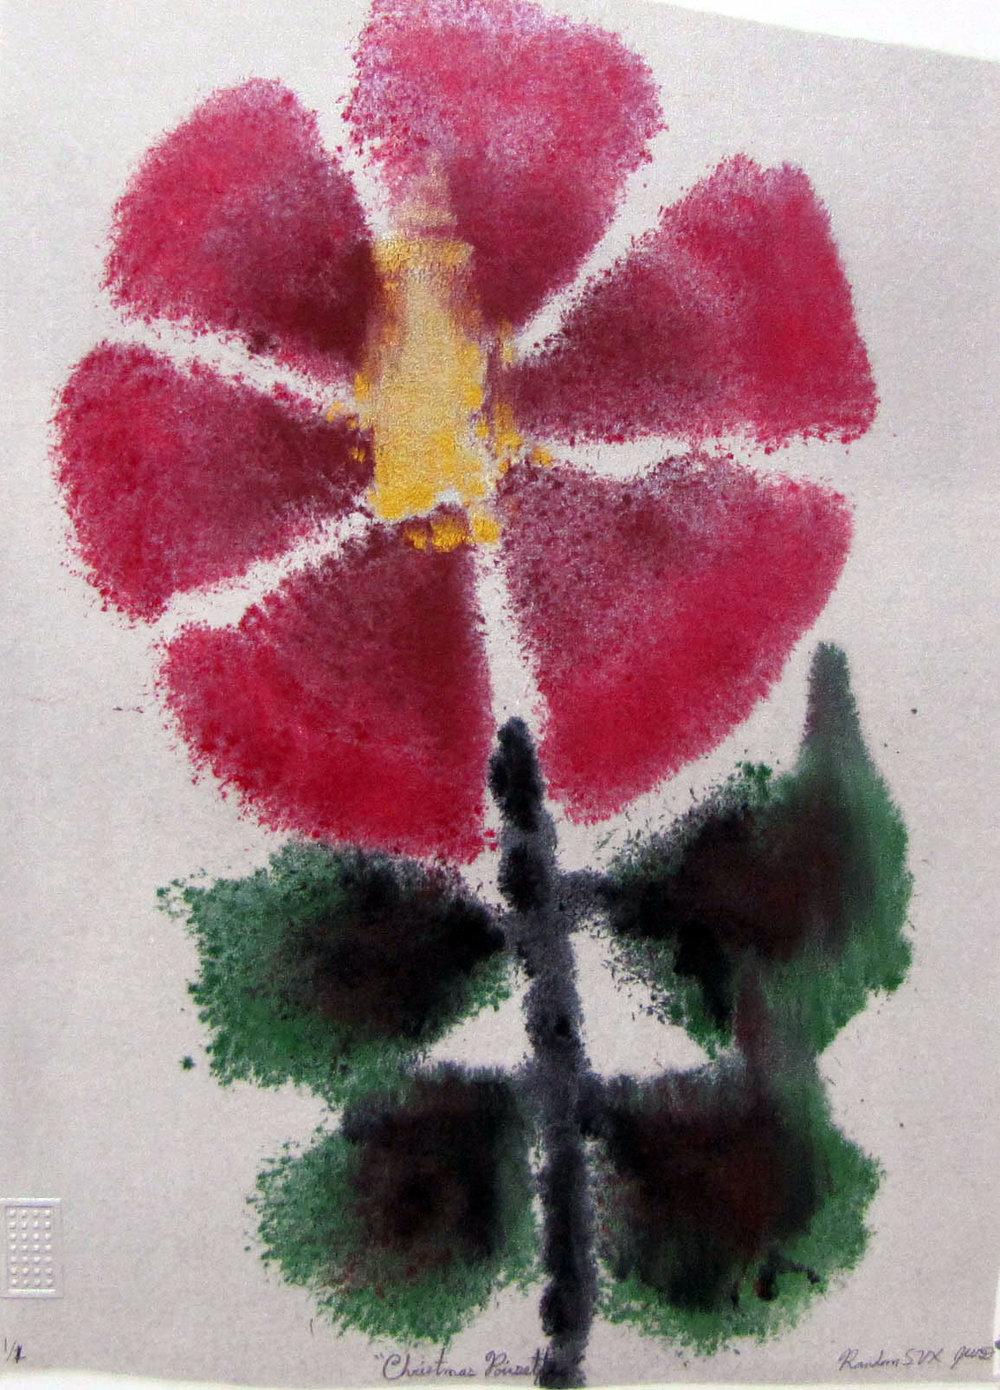 Christmas Poinsettia- Jacob Doerr.jpg